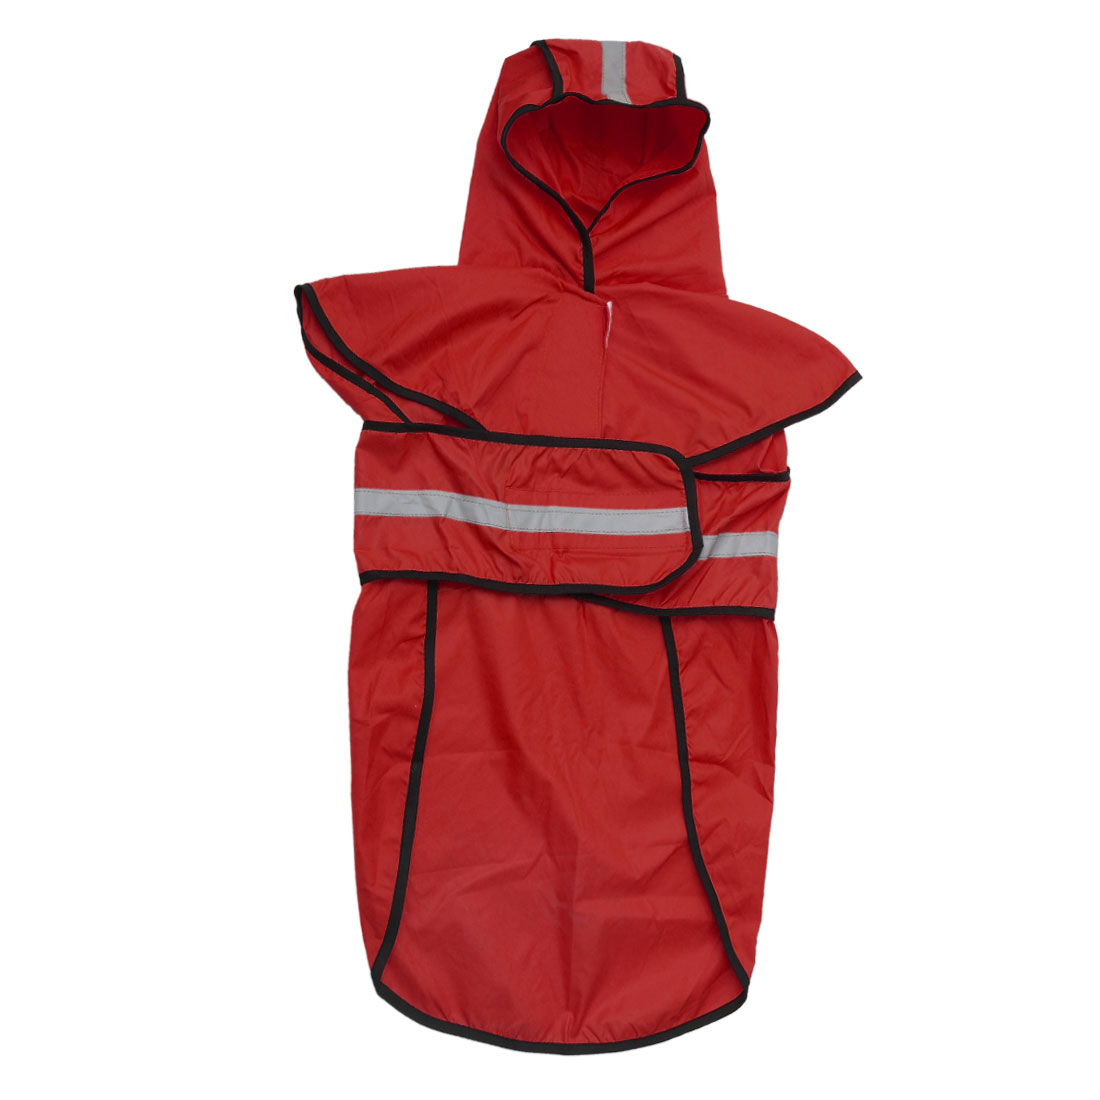 Pet Dogs Raincoat Rain Jacket Poncho Cloth Water-resistant Rainwears Red S